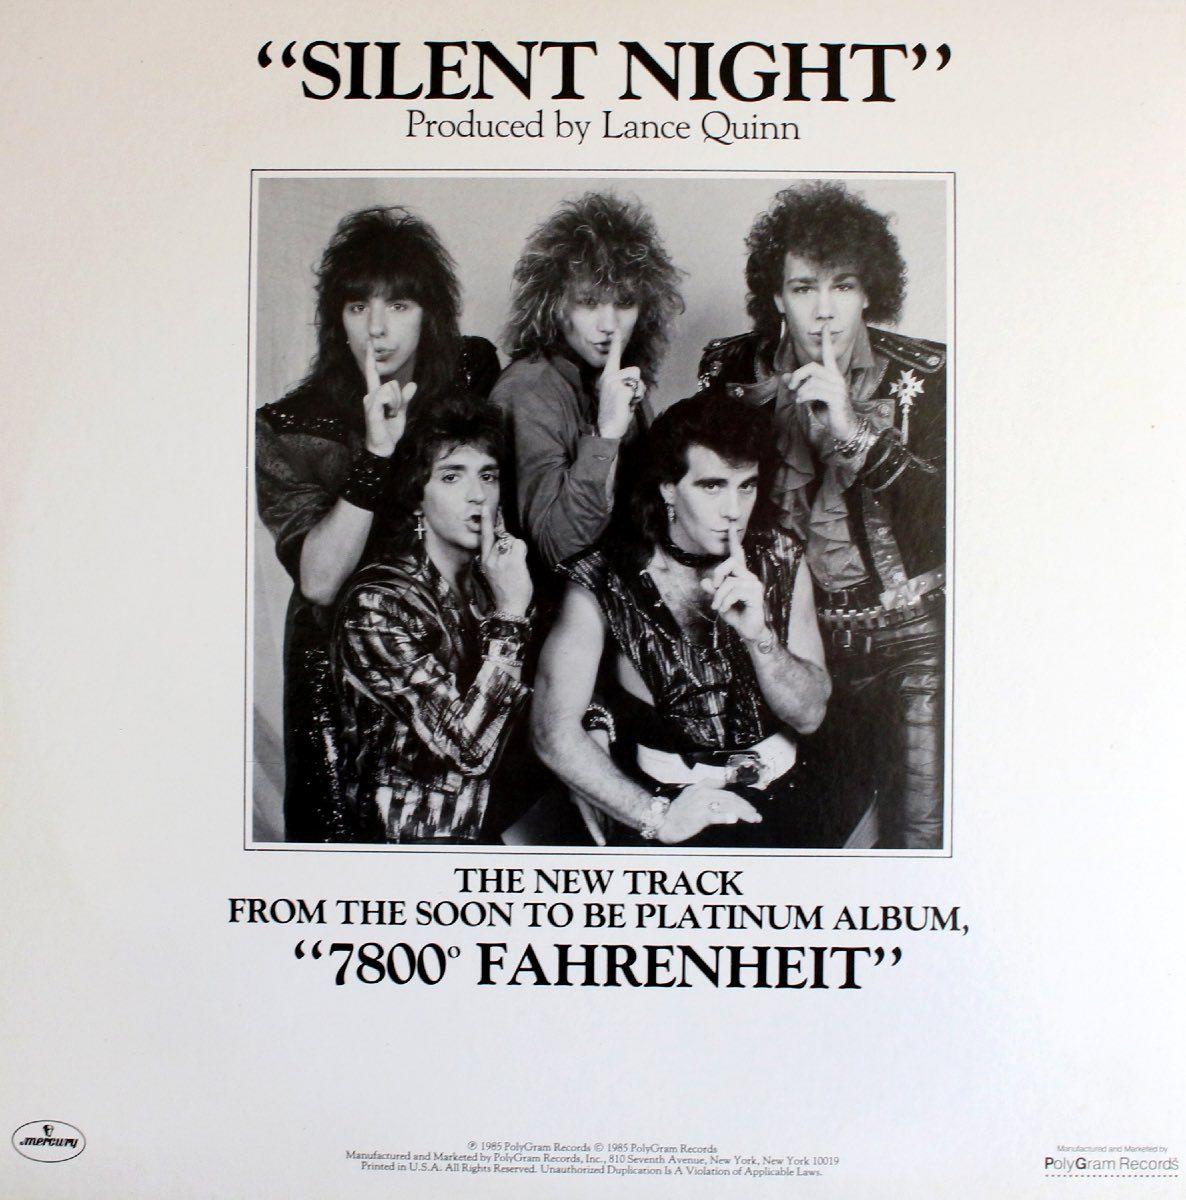 On Tour With Bon Jovi In The 1980s Flashbak Bon Jovi Jon Bon Jovi Silent Night